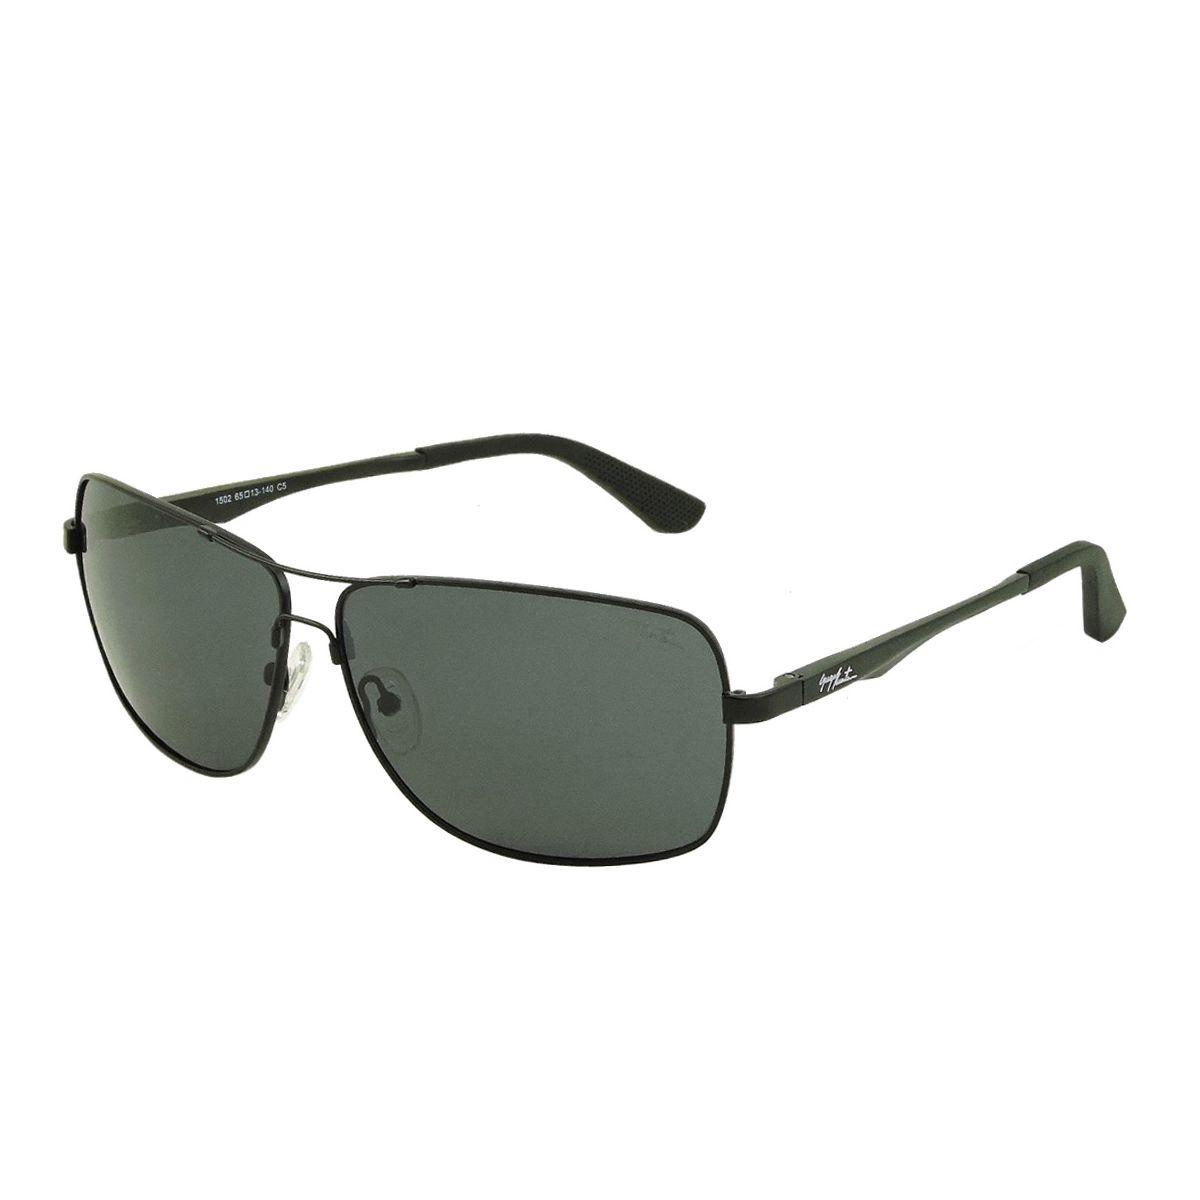 Óculos de Sol Masculino GUGA KUERTEN Flexivel Metal Preto Polarizado  GK132.2. Passe o mouse e veja detalhes ce52db42d0